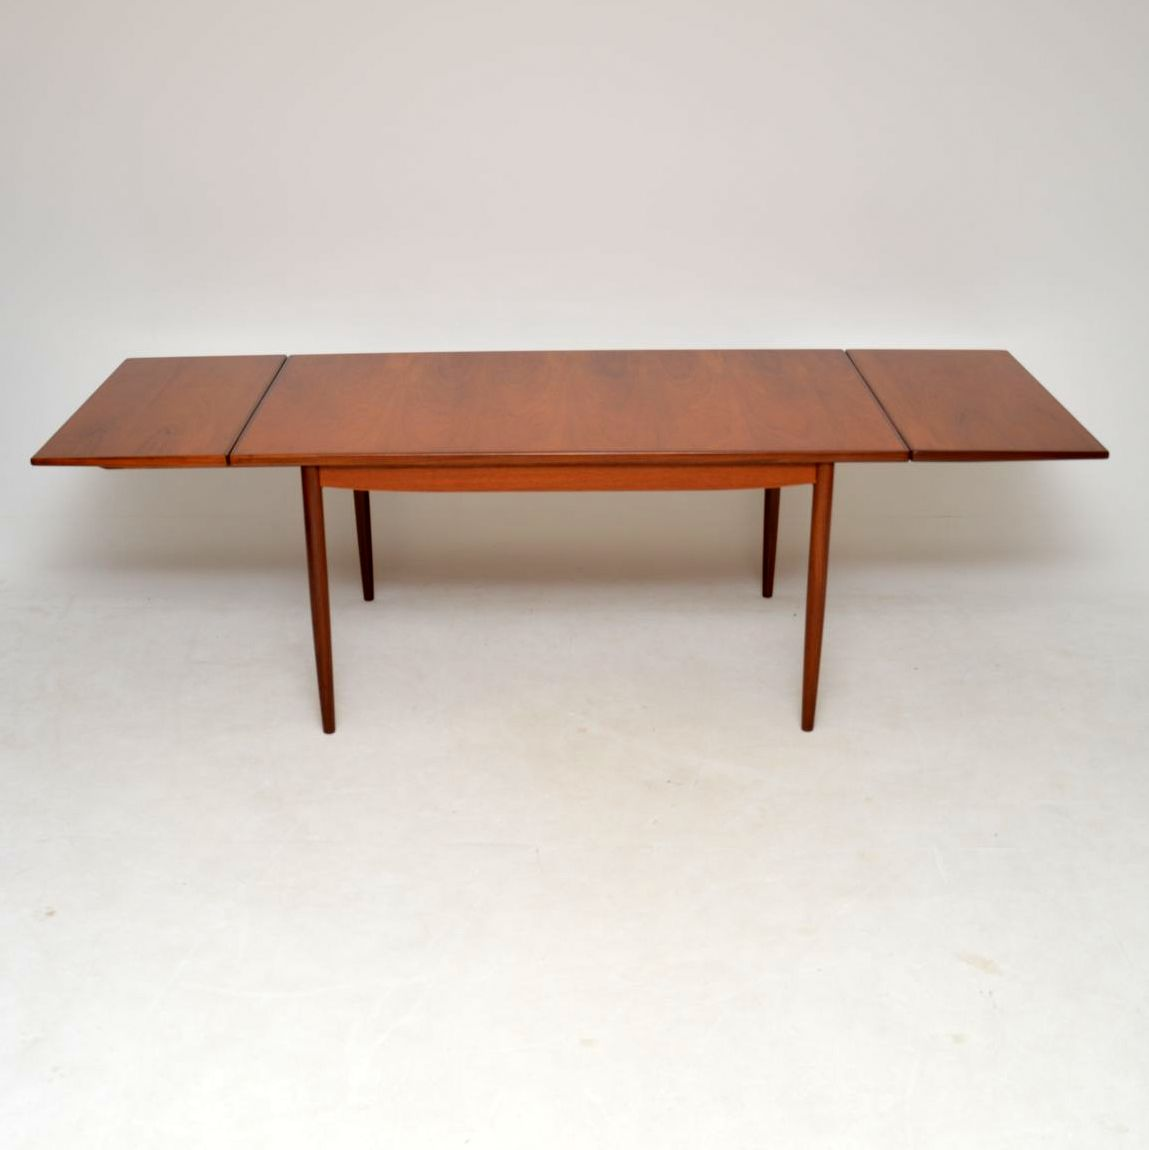 danish_teak_retro_vintage_dining_table_kofod_larsen_3